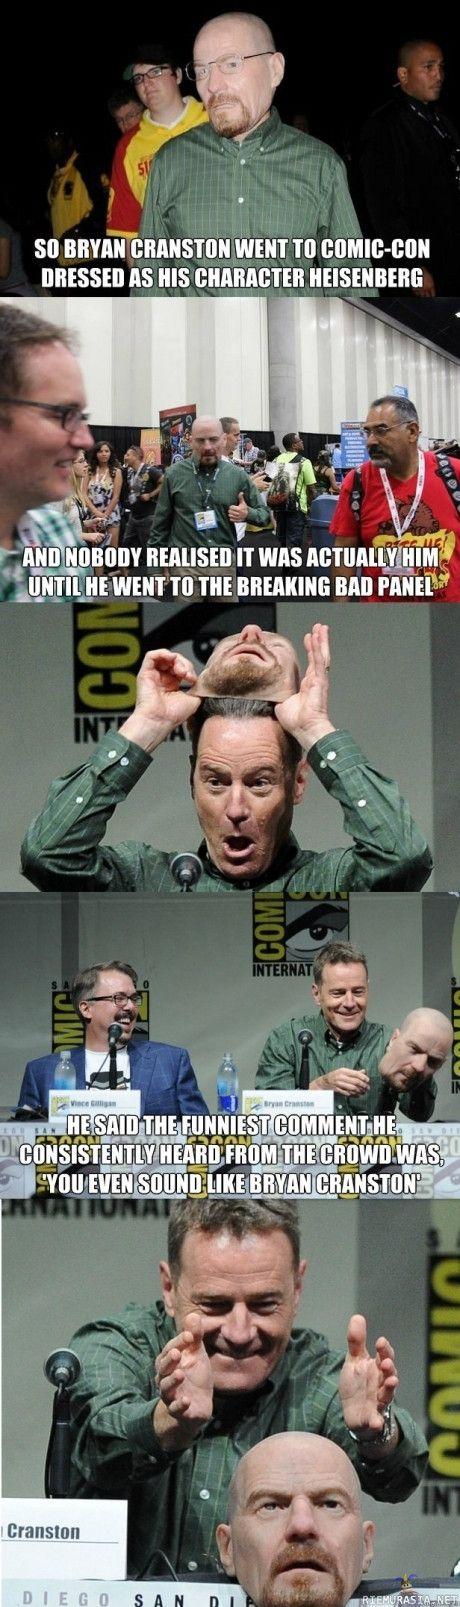 Love me some breaking bad!! Bryan Cranston in comic con